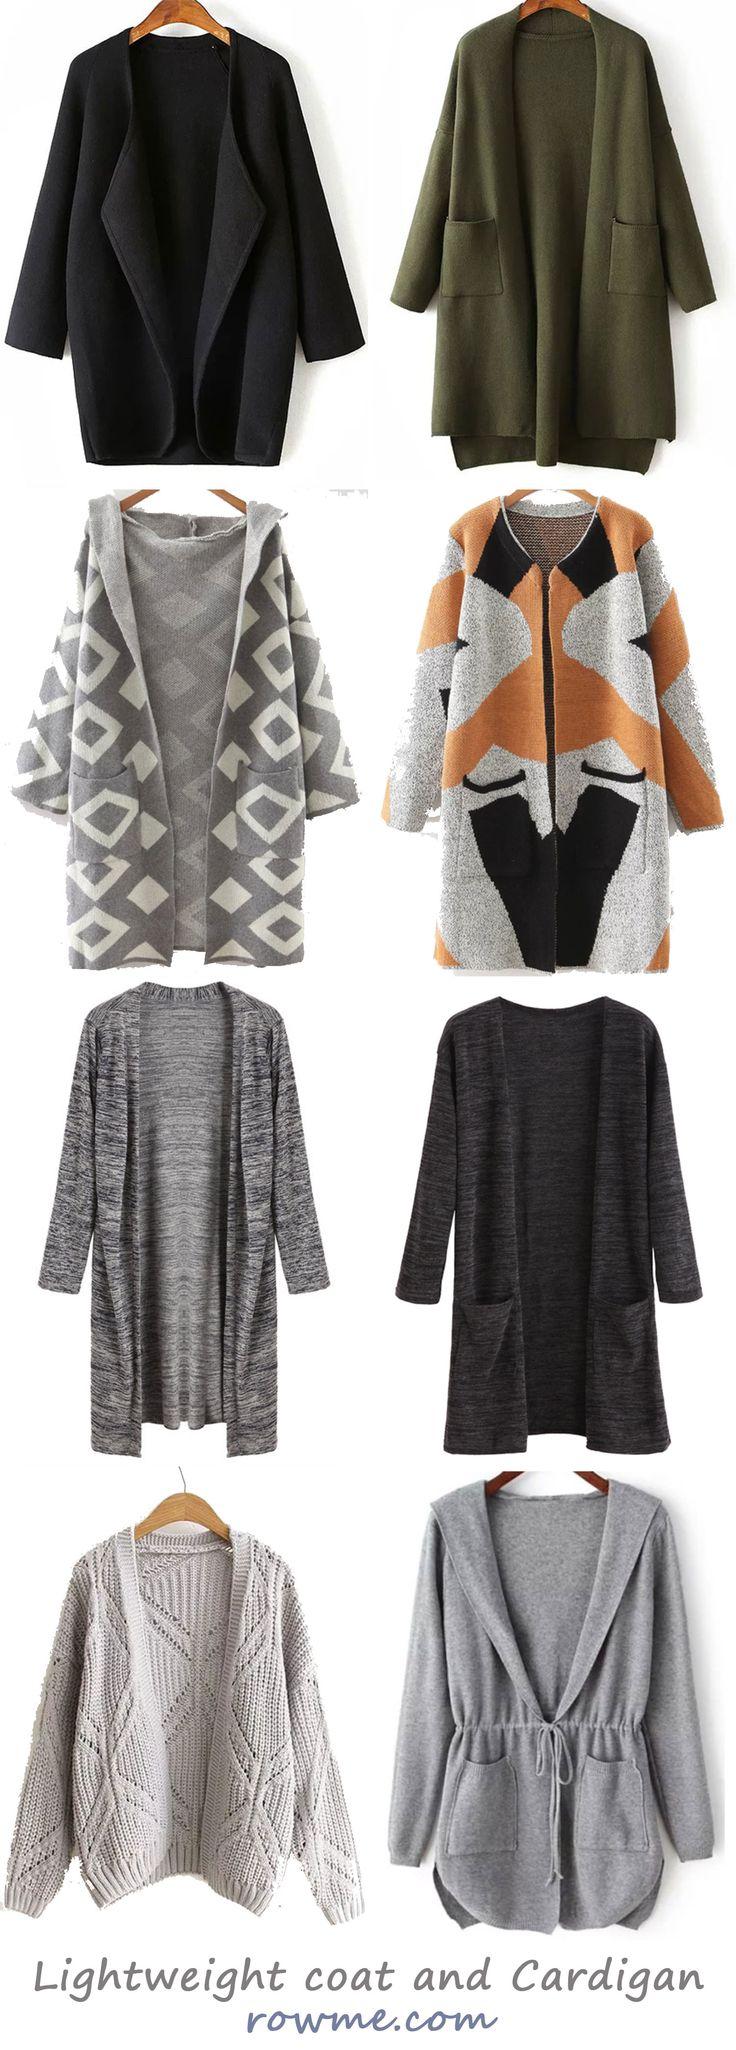 Chic fall lightweight coat and cardigan - rowme.com